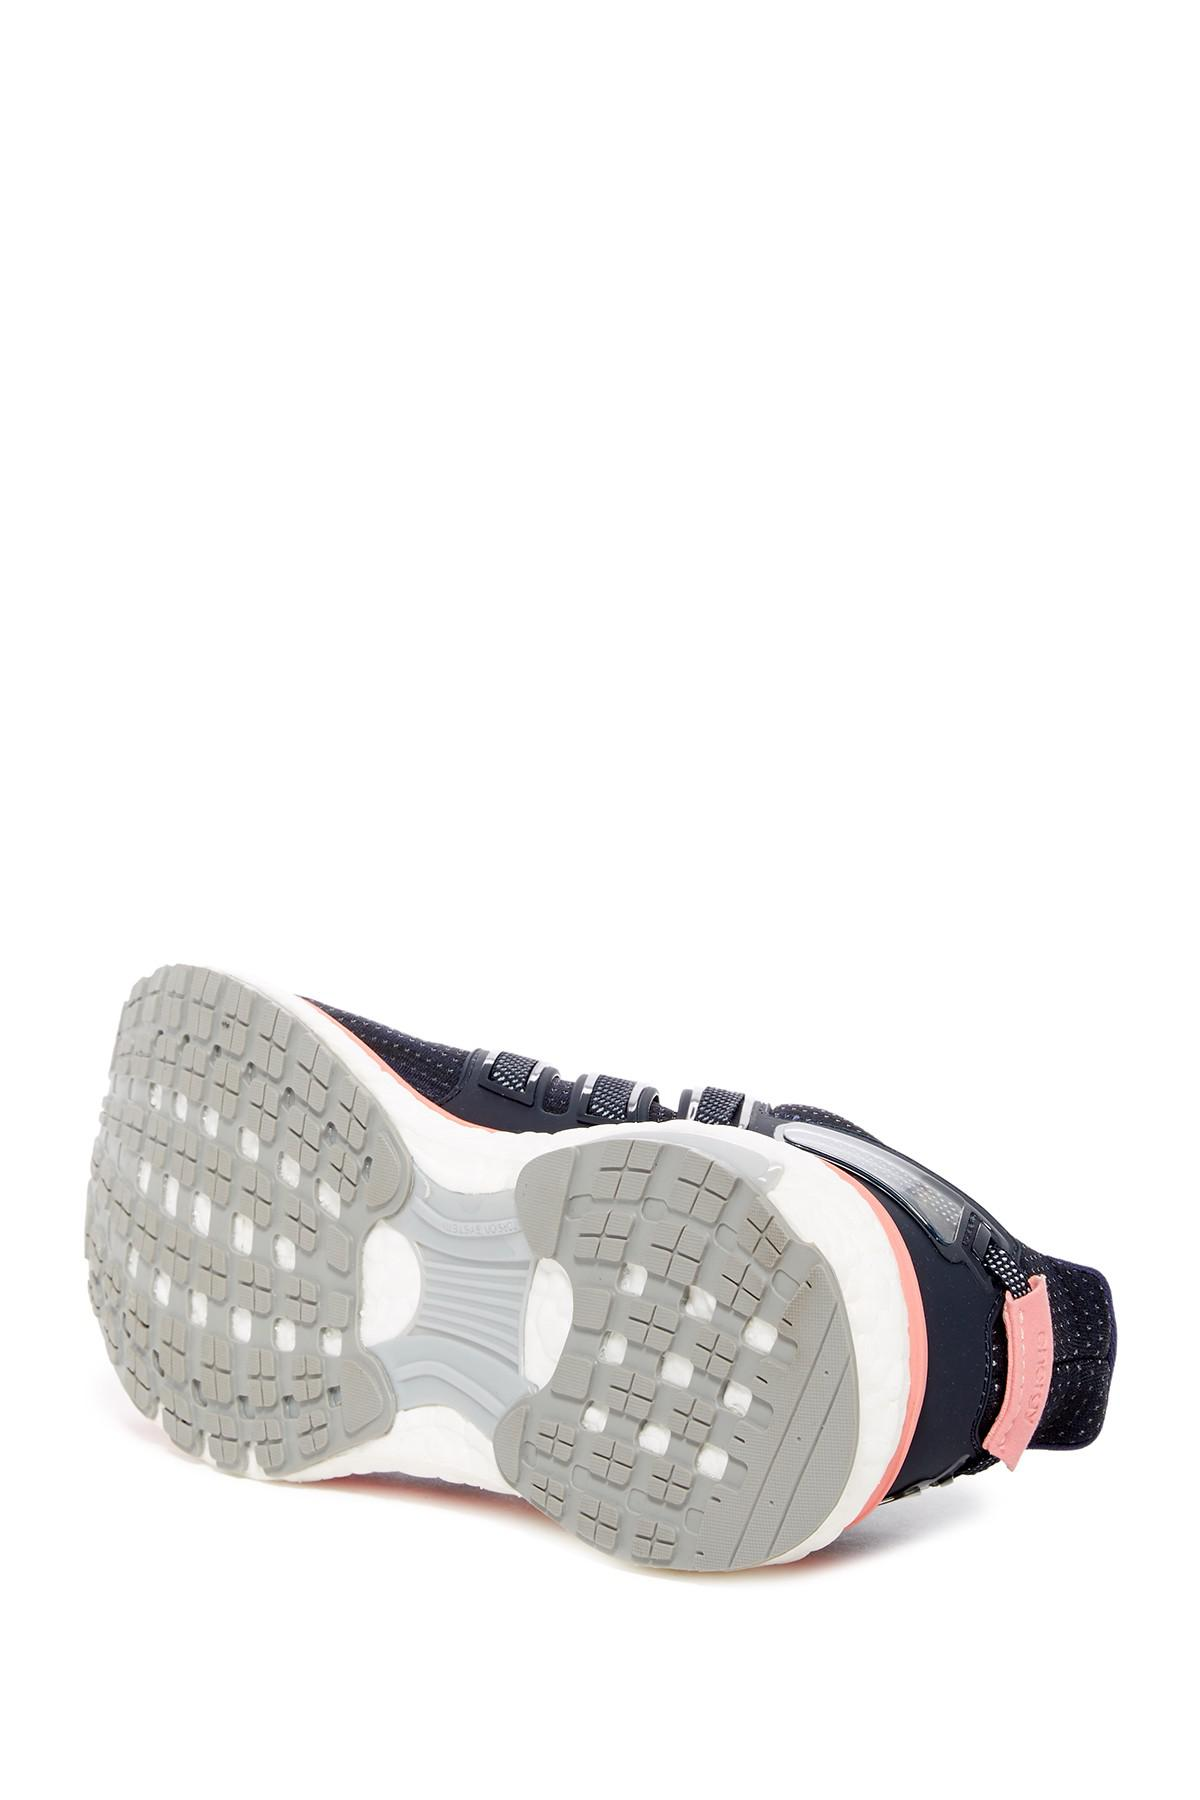 lyst adidas energia impulso 3 scarpe da ginnastica in blu